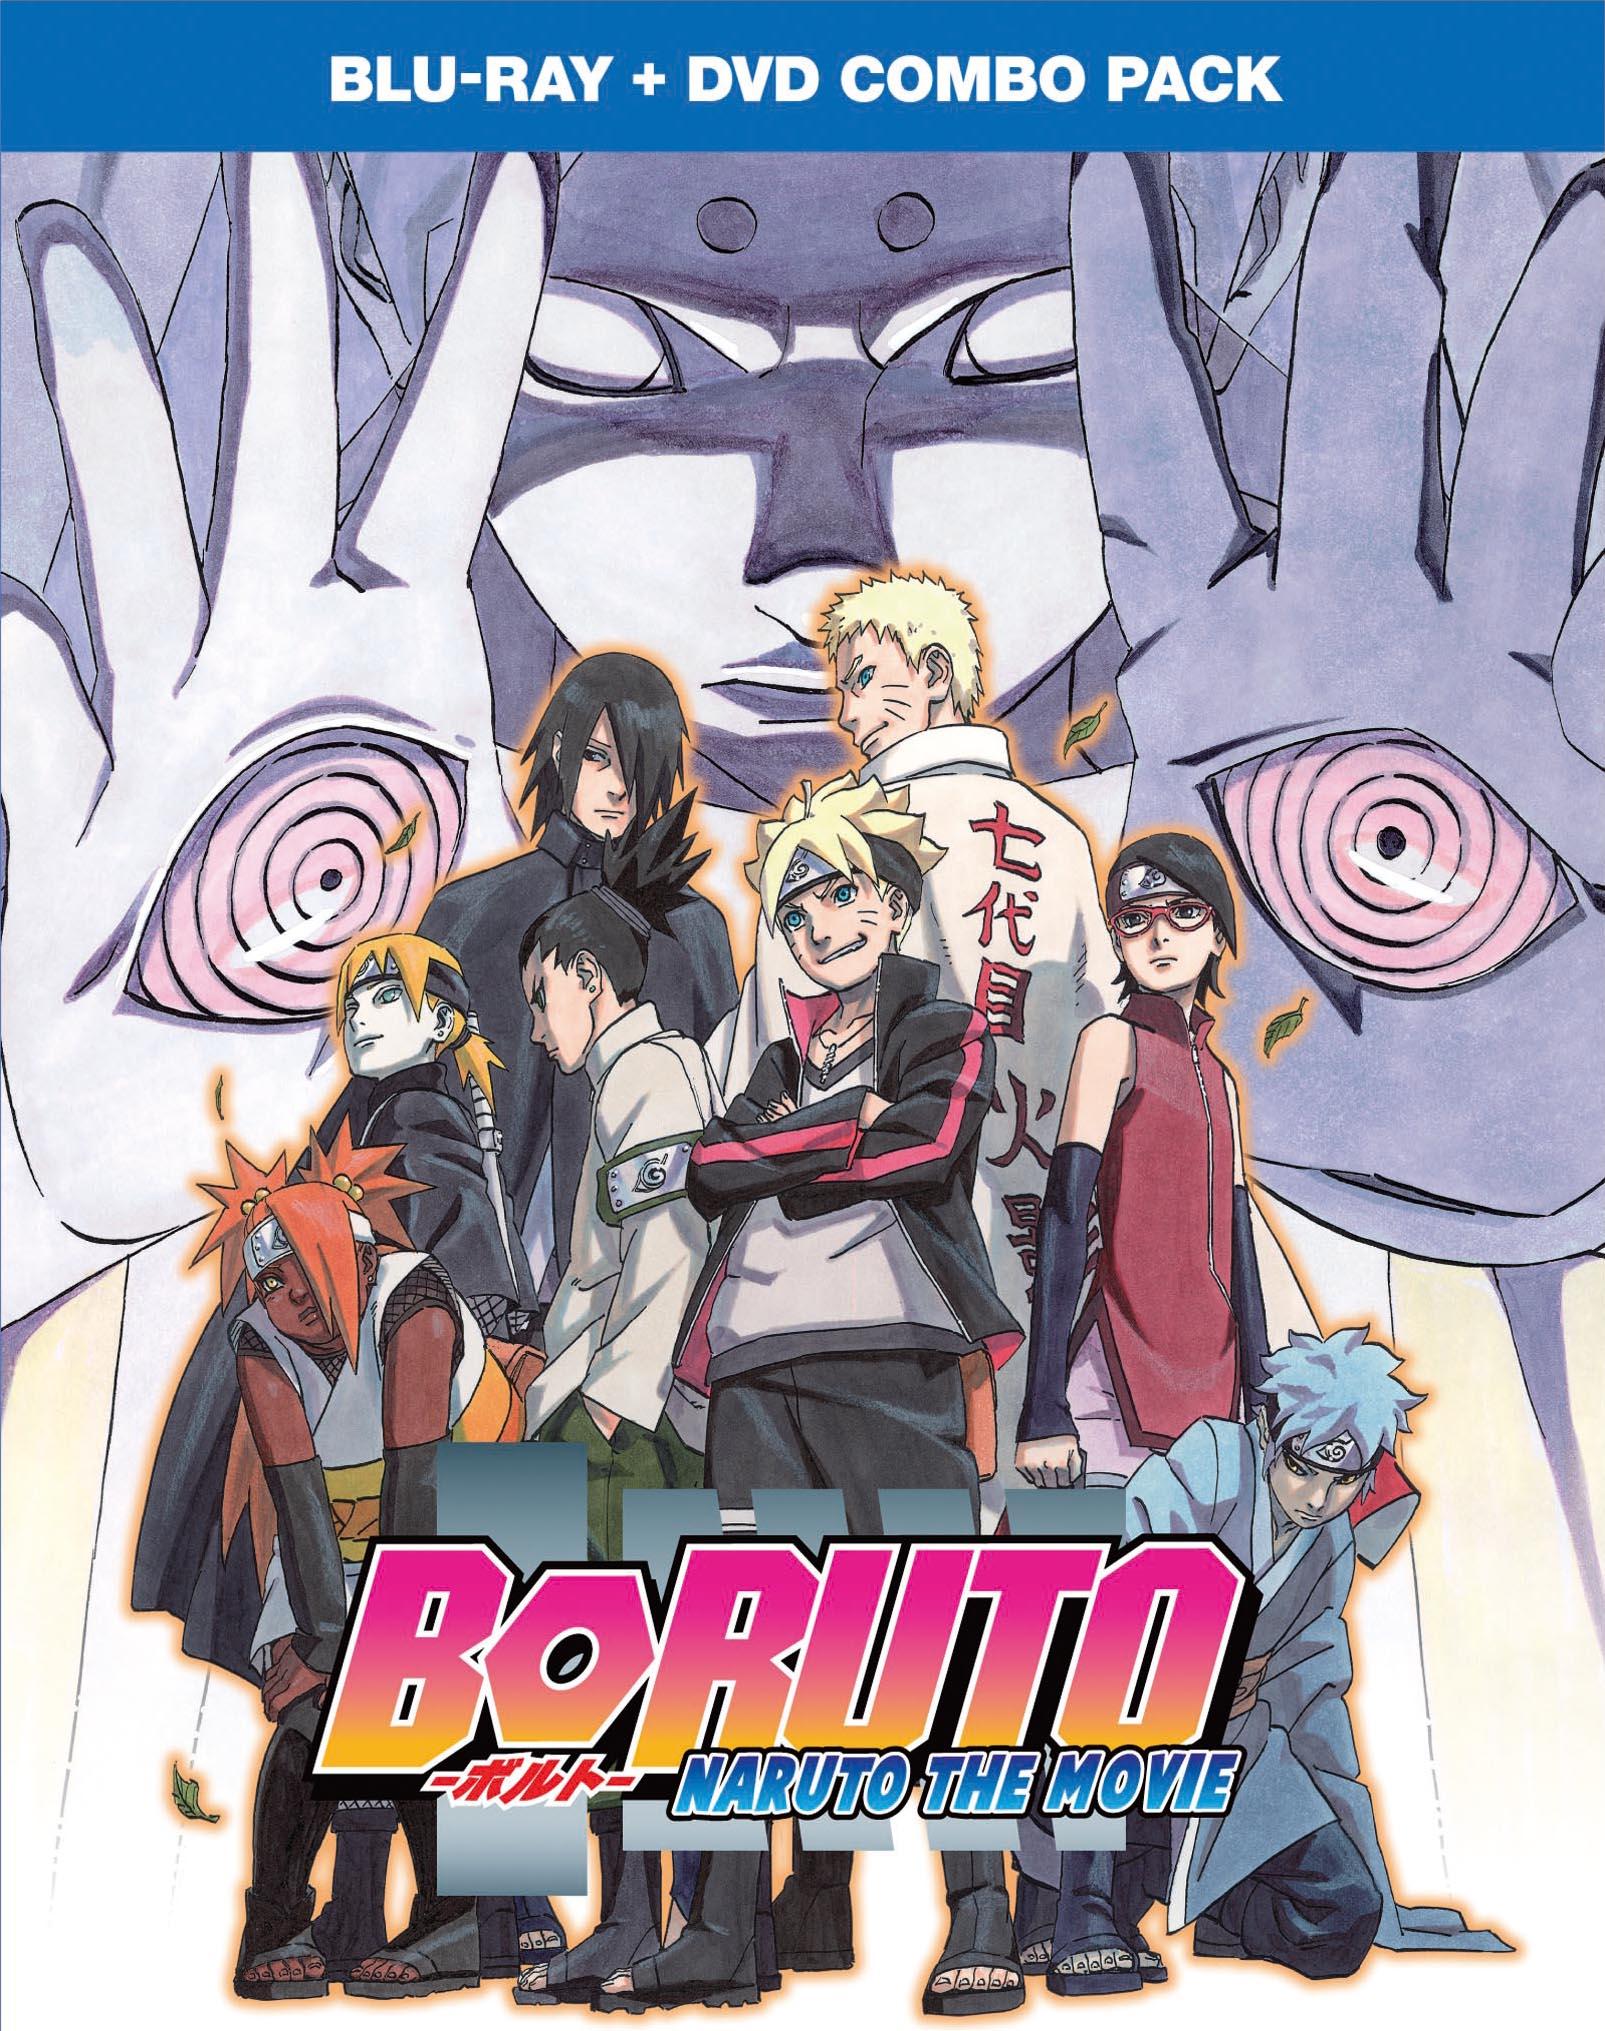 VIZ | Watch Boruto: Naruto Next Generations Episode 122 for Free